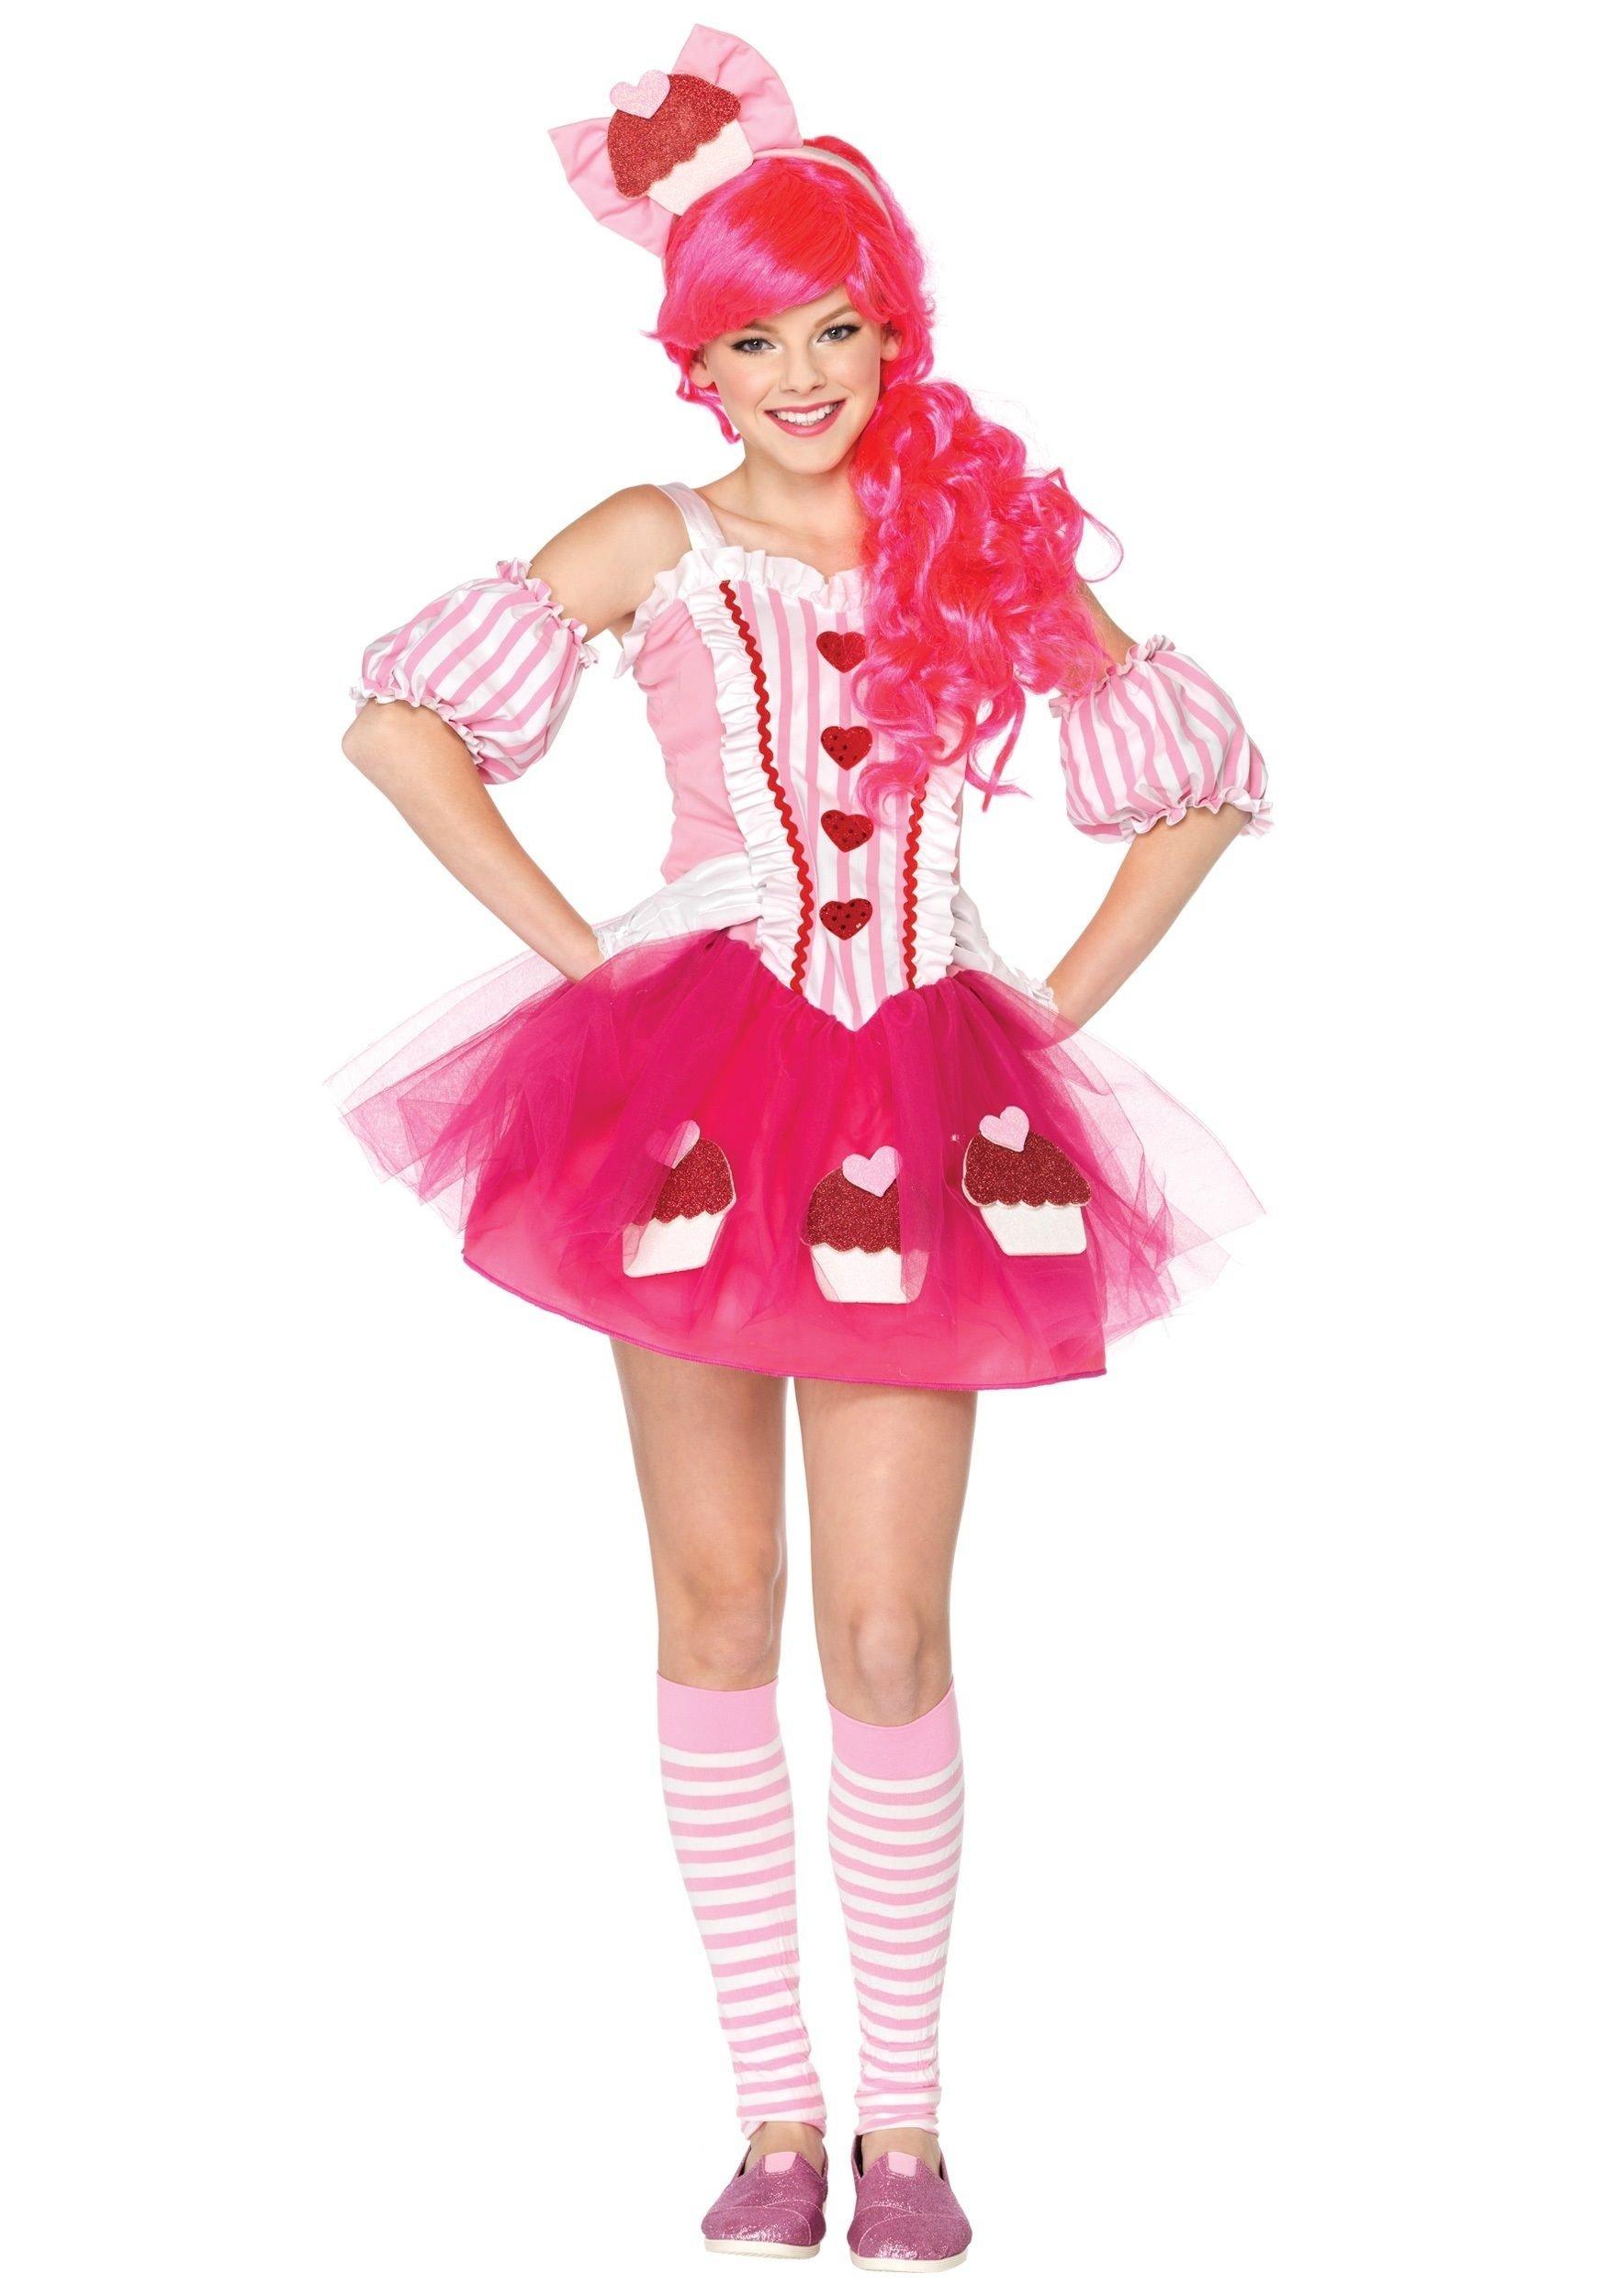 10 Unique Cute Halloween Costume Ideas For Girls cute halloween costumes for teens cute teen girl halloween costume 1